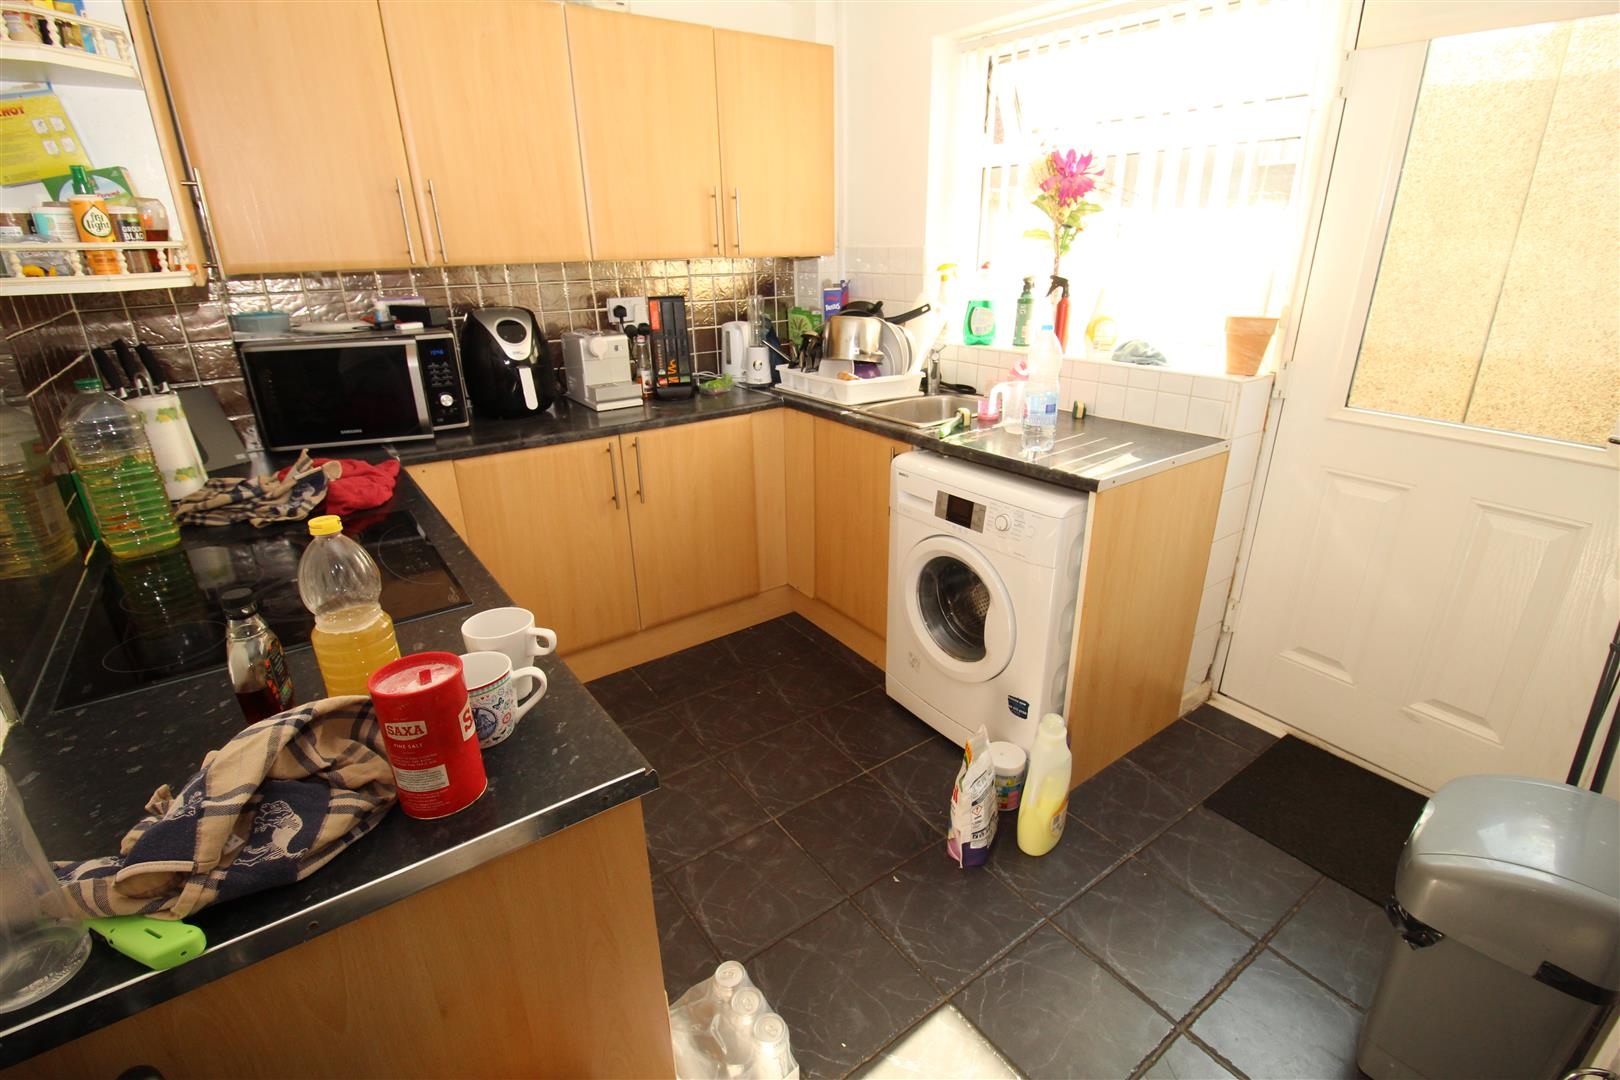 2 Bedrooms, House - Terraced, Maureen Walk, Fazakerley, Liverpool